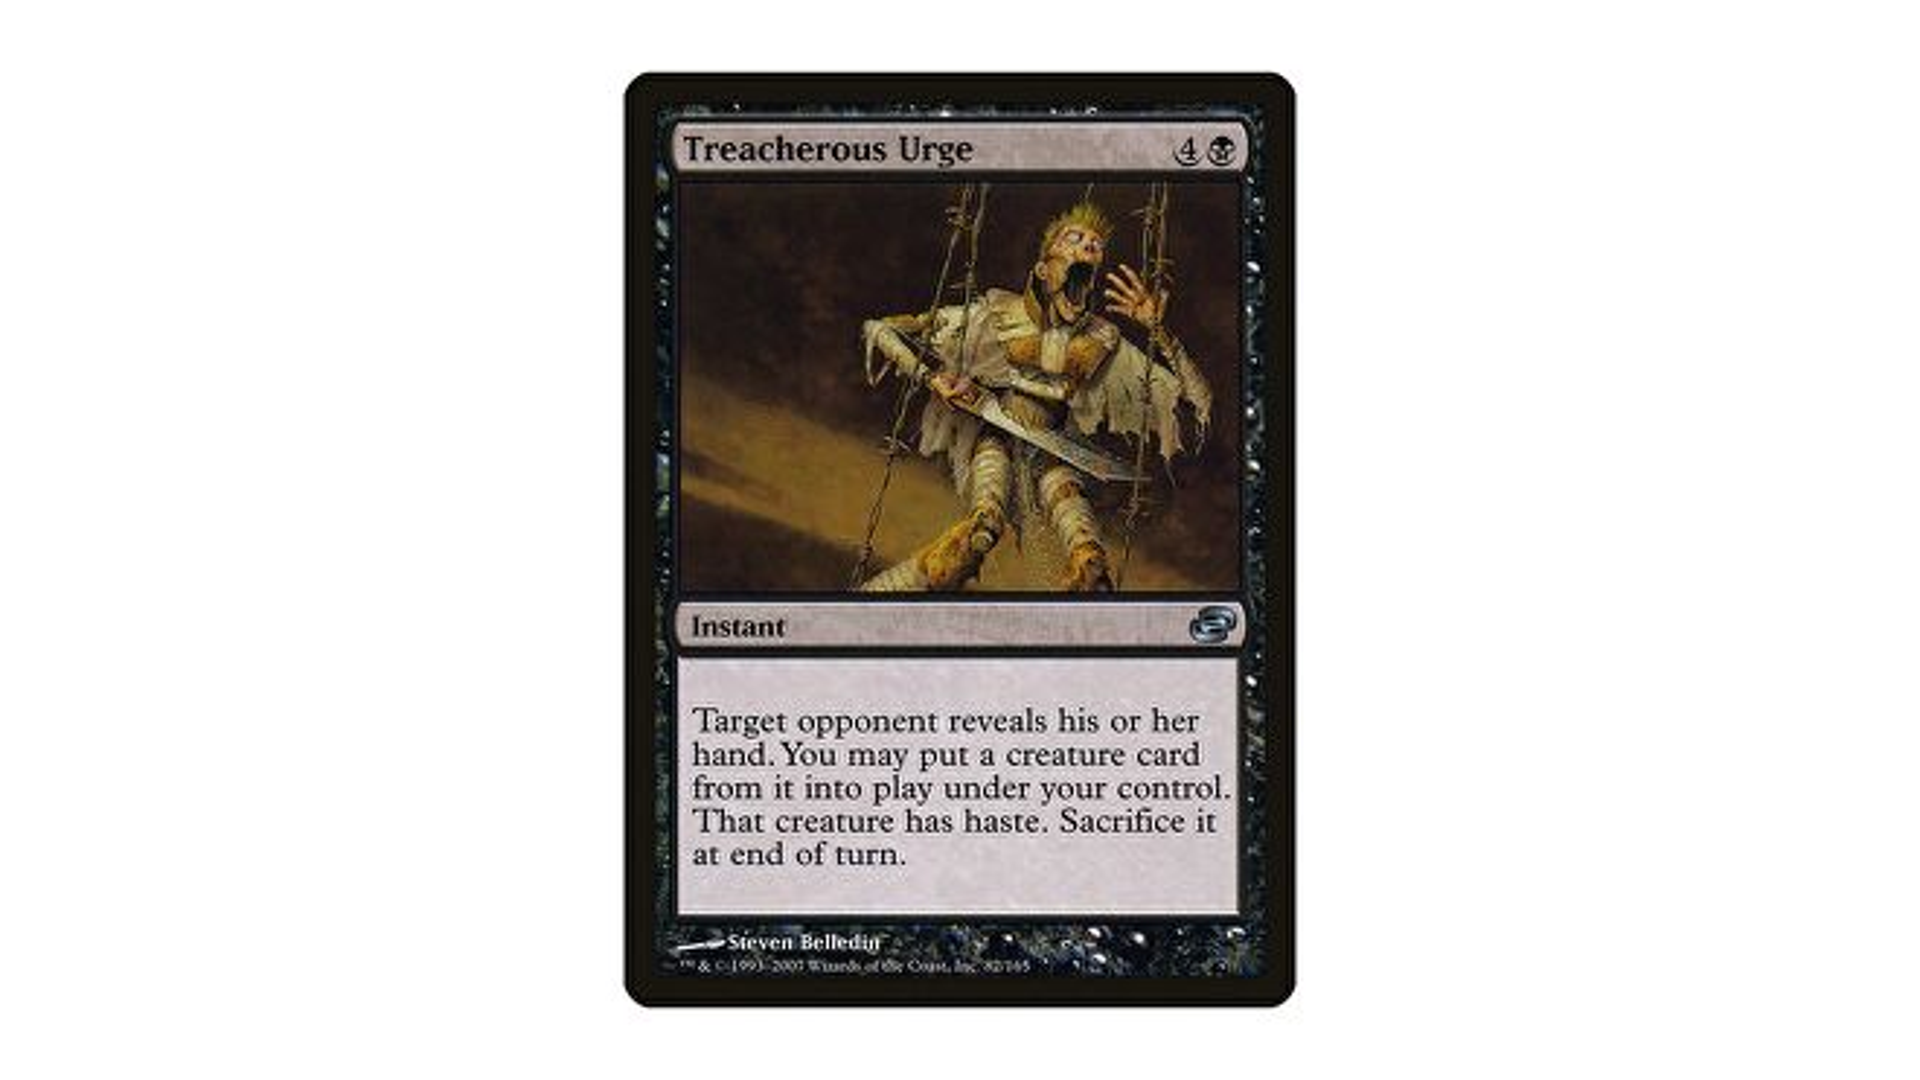 Magic: The Gathering card